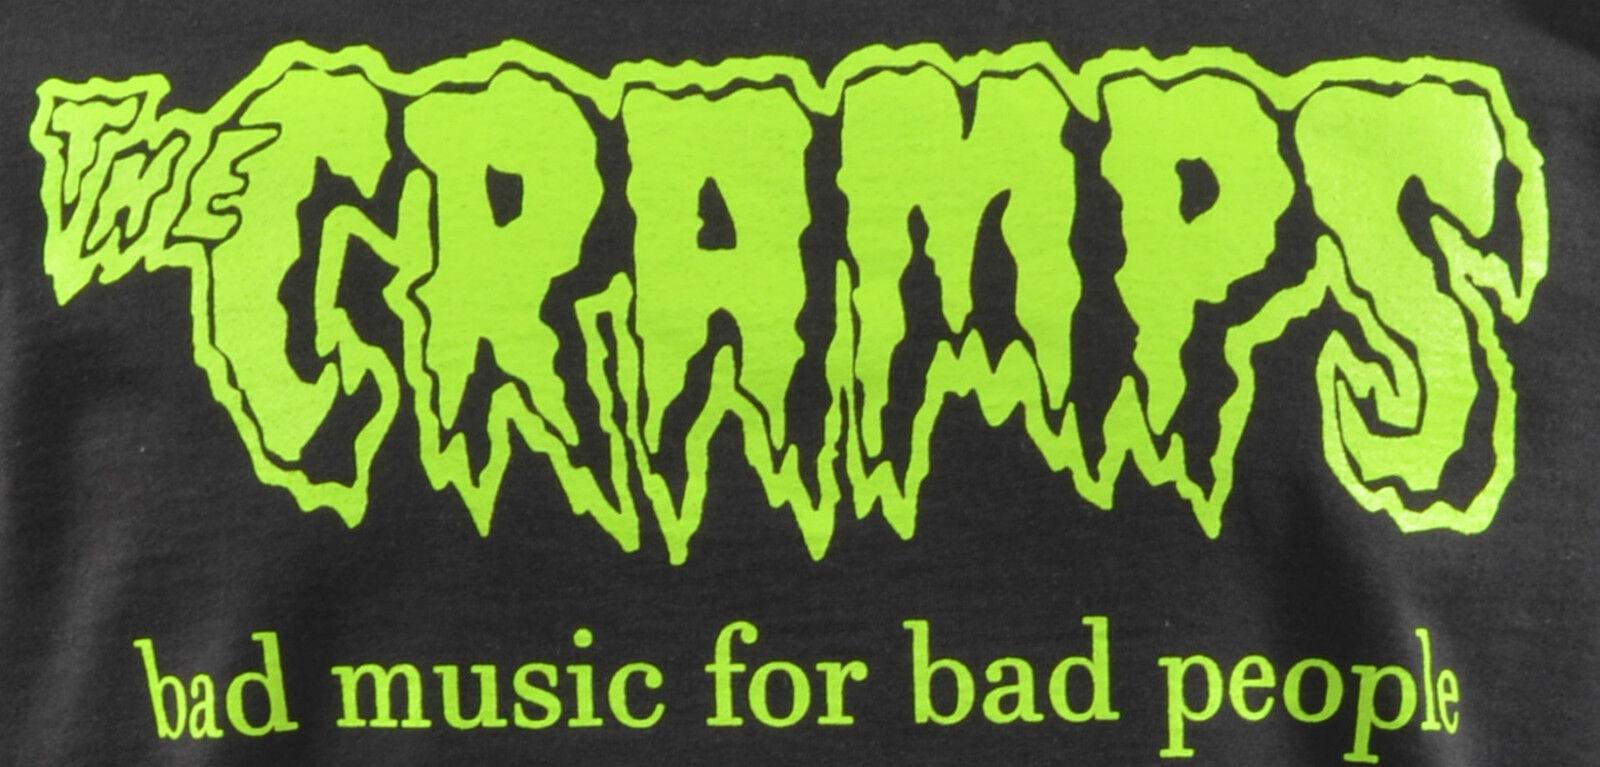 WOMENS LONG HOODIE DRESS THE CRAMPS BAD MUSIC PSYCHOBILLY PSYCHOBILLY PSYCHOBILLY HORROR LUX S-XL 41d330